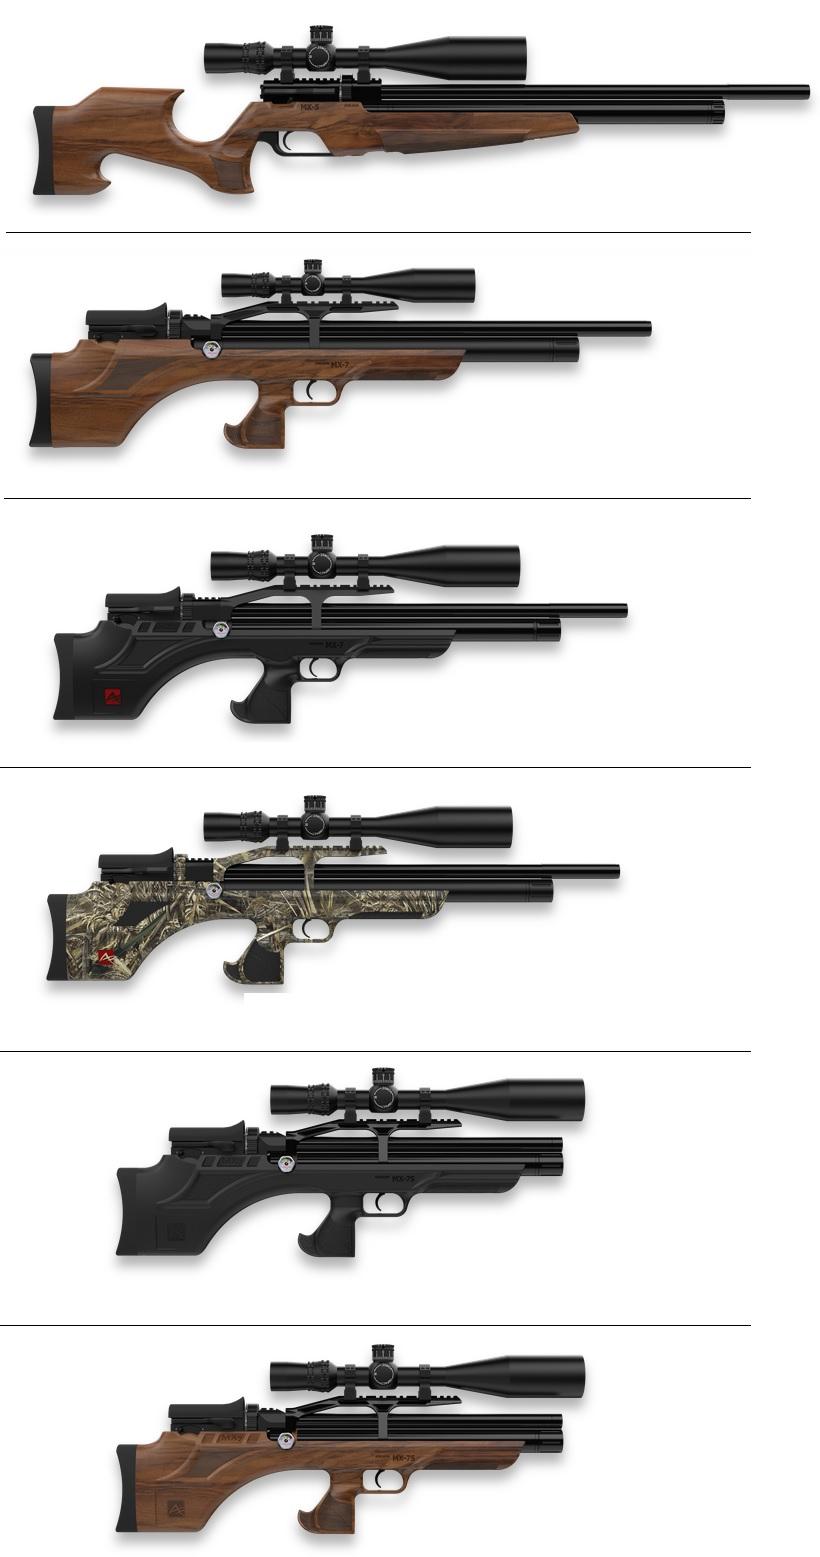 каталог винтовок aselkon